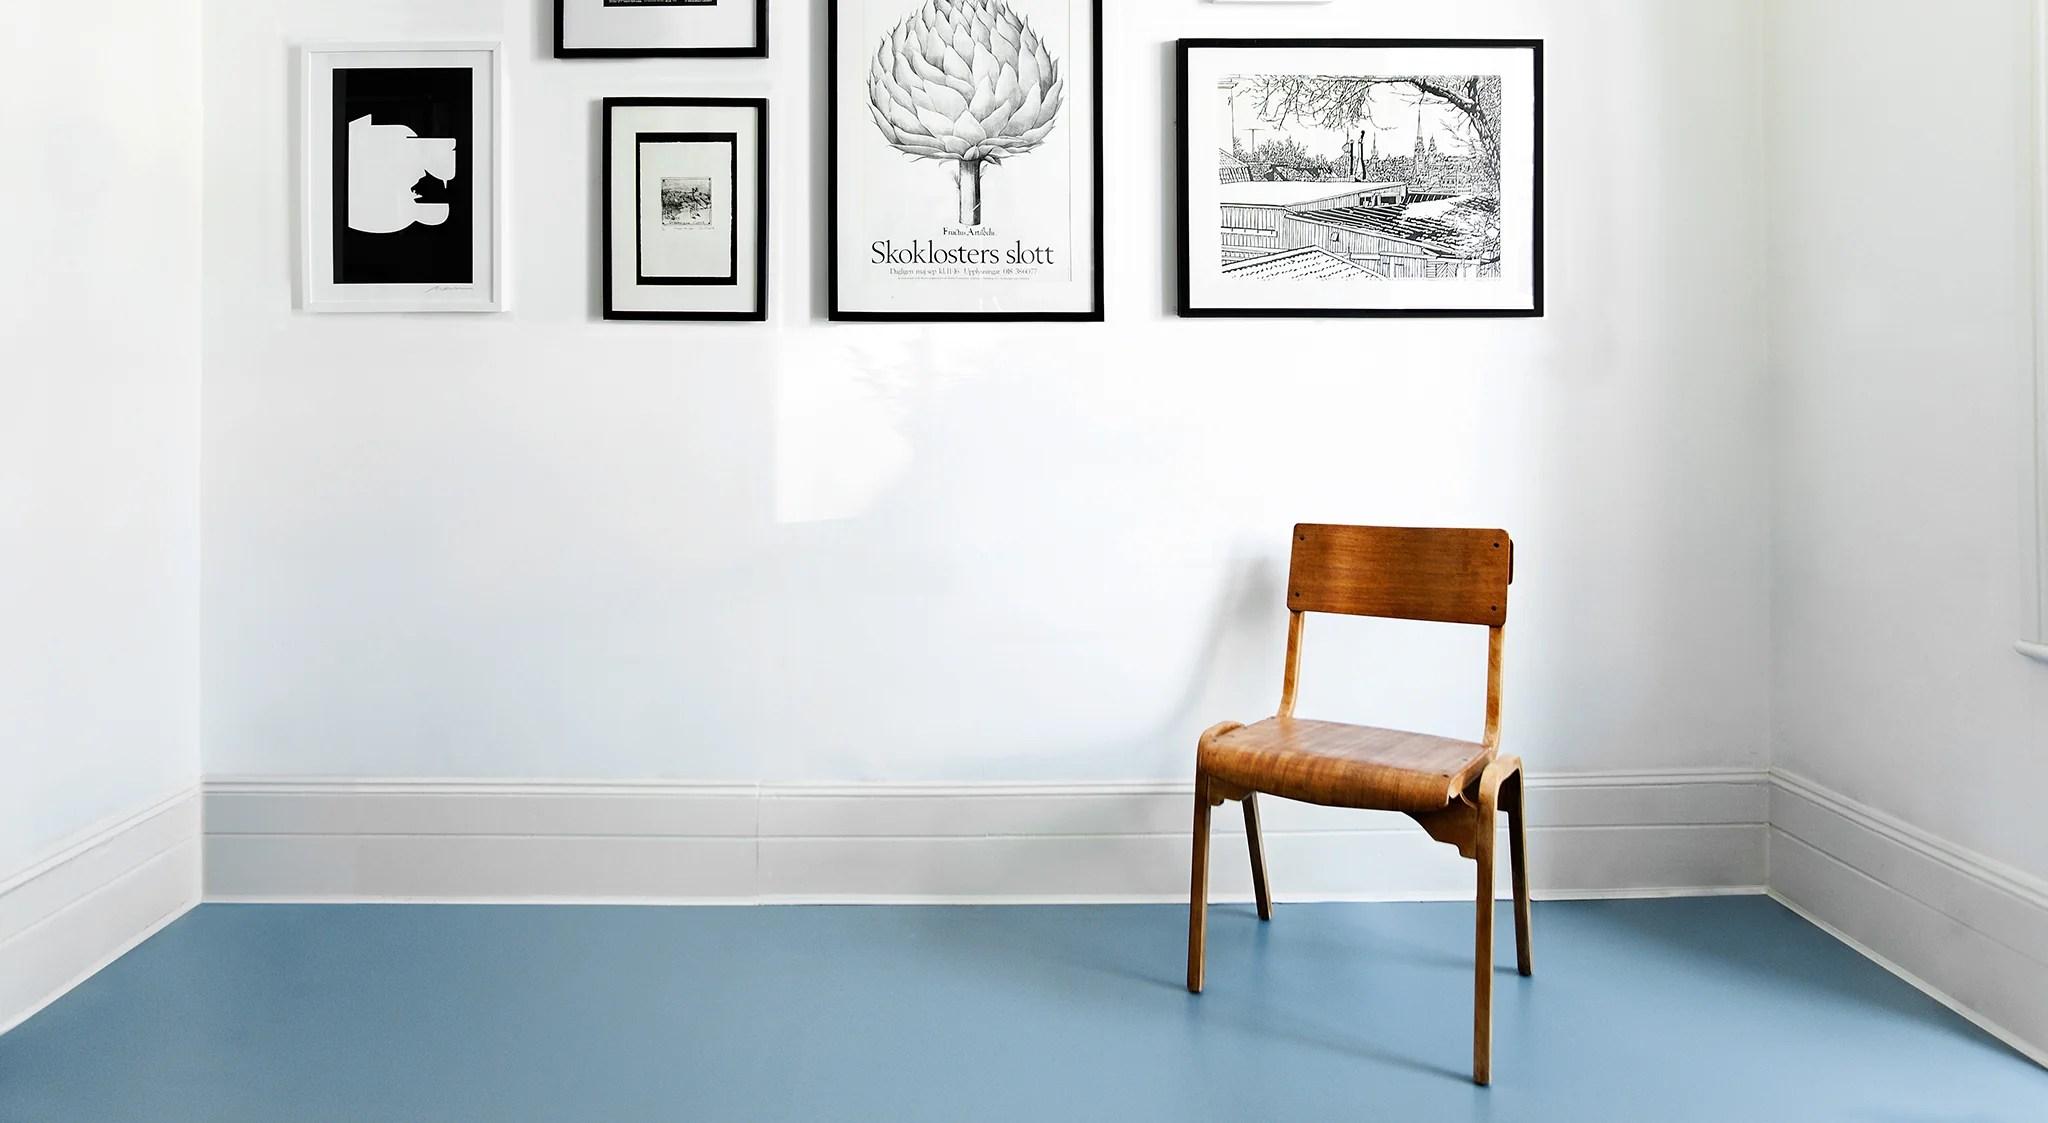 Luxury cork rubber and vinyl flooring in modern plain